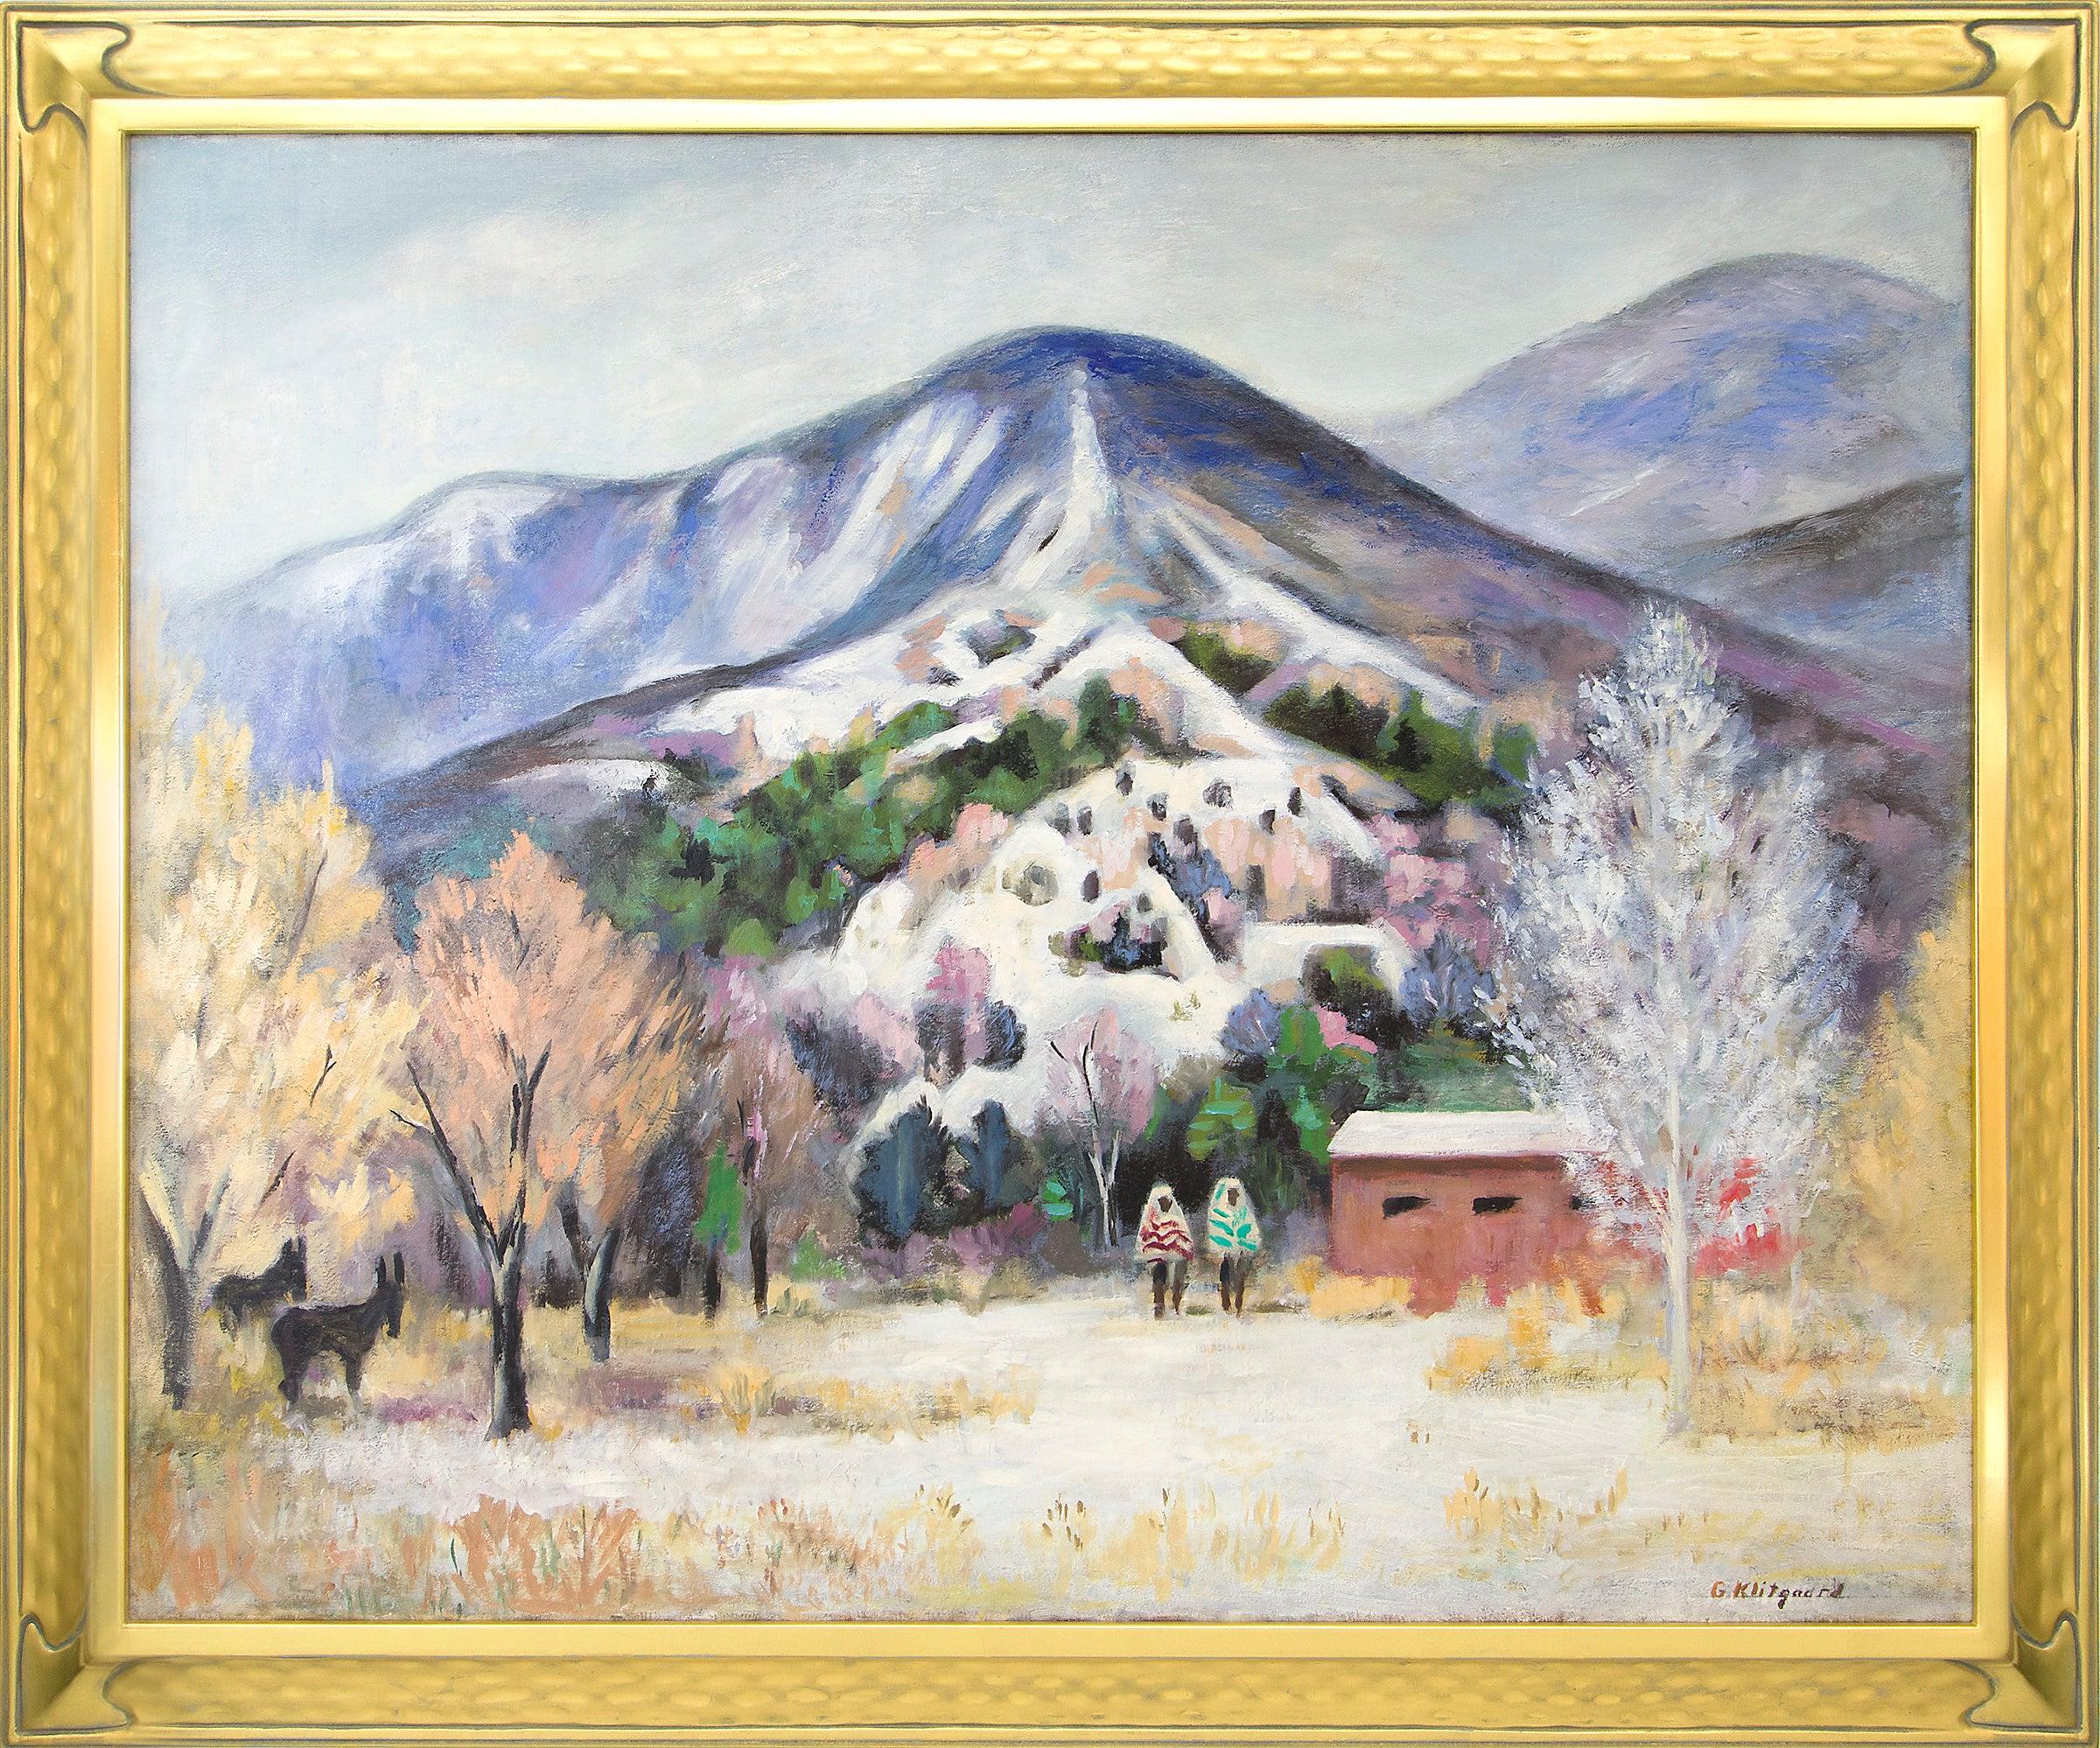 Sangre de Cristo Scene (Southern Colorado Mountain Landscape with Snow)